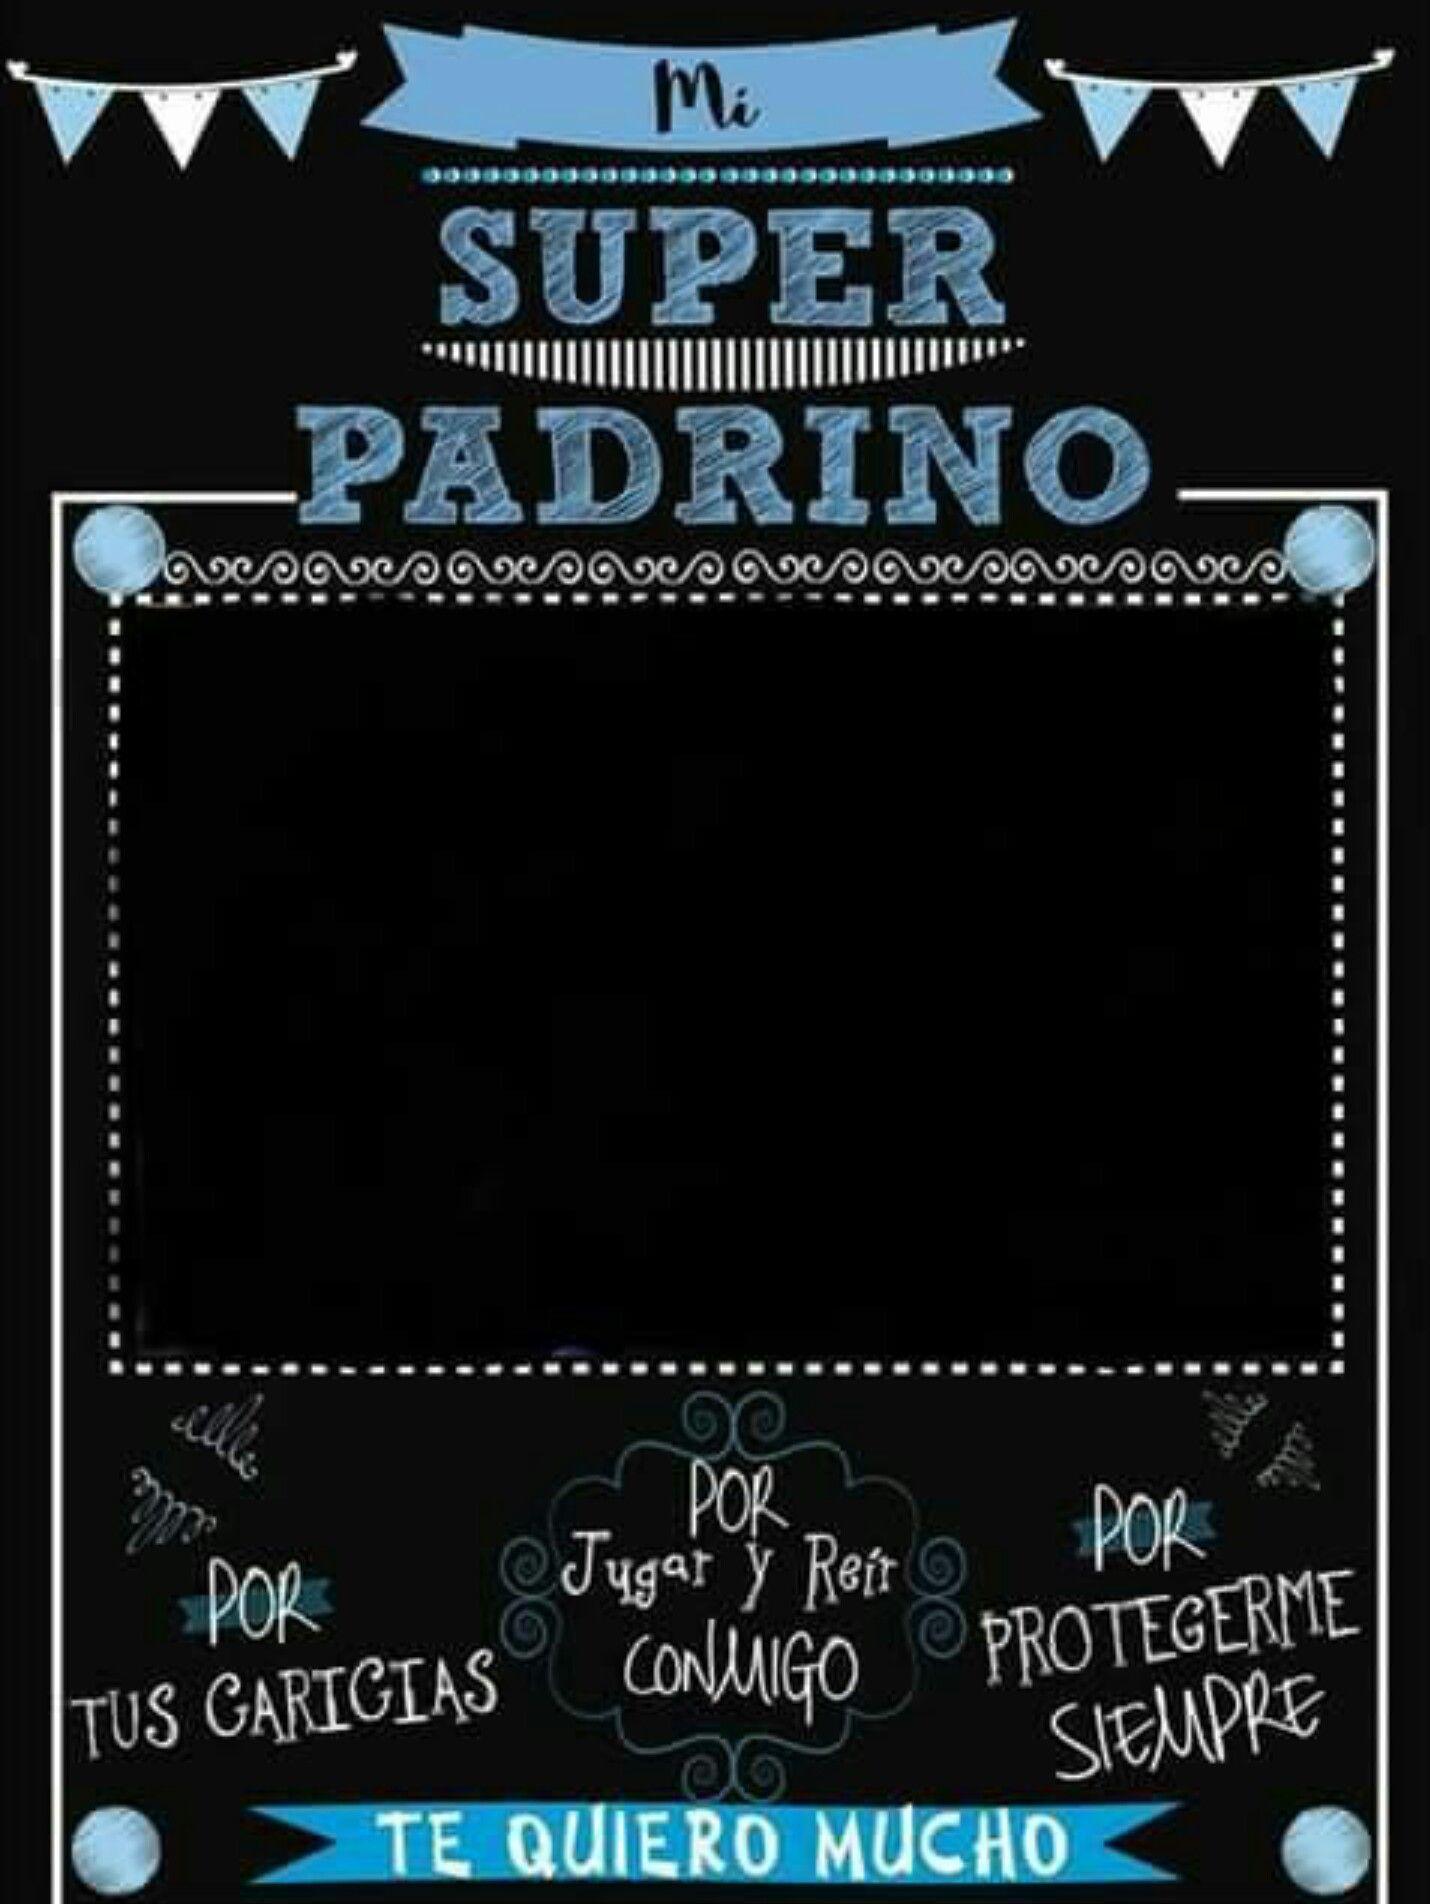 Mi Super Padrino Azul Negro Blanco Invitaciones Pinterest